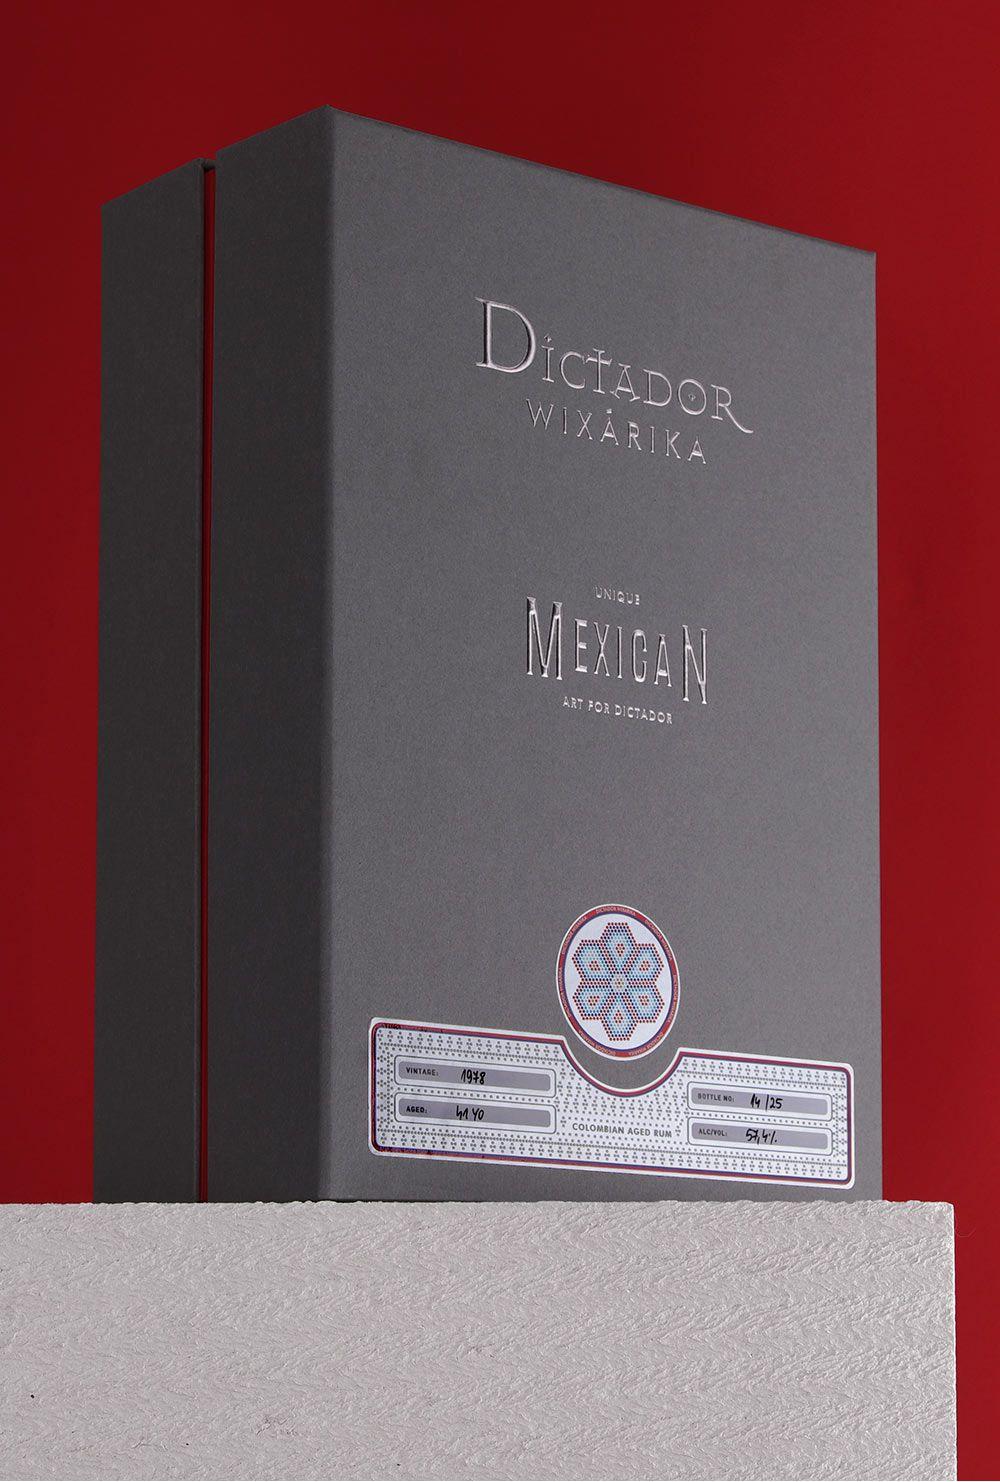 Dictador Wixarika - Model 2018/1